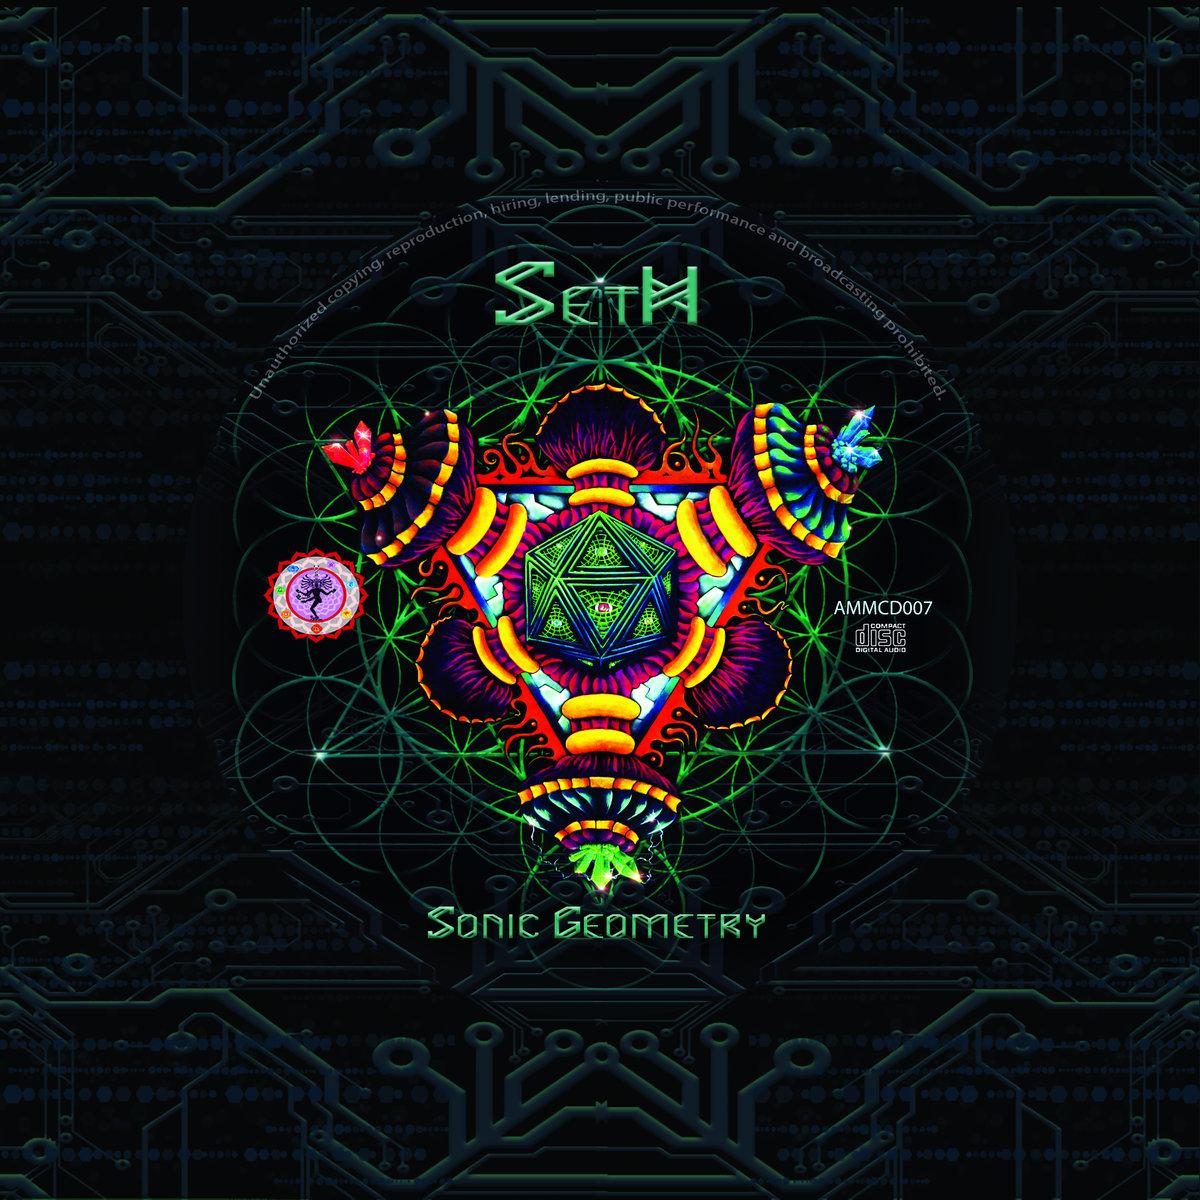 Seth - Sonic Geometry | Active Meditation Music